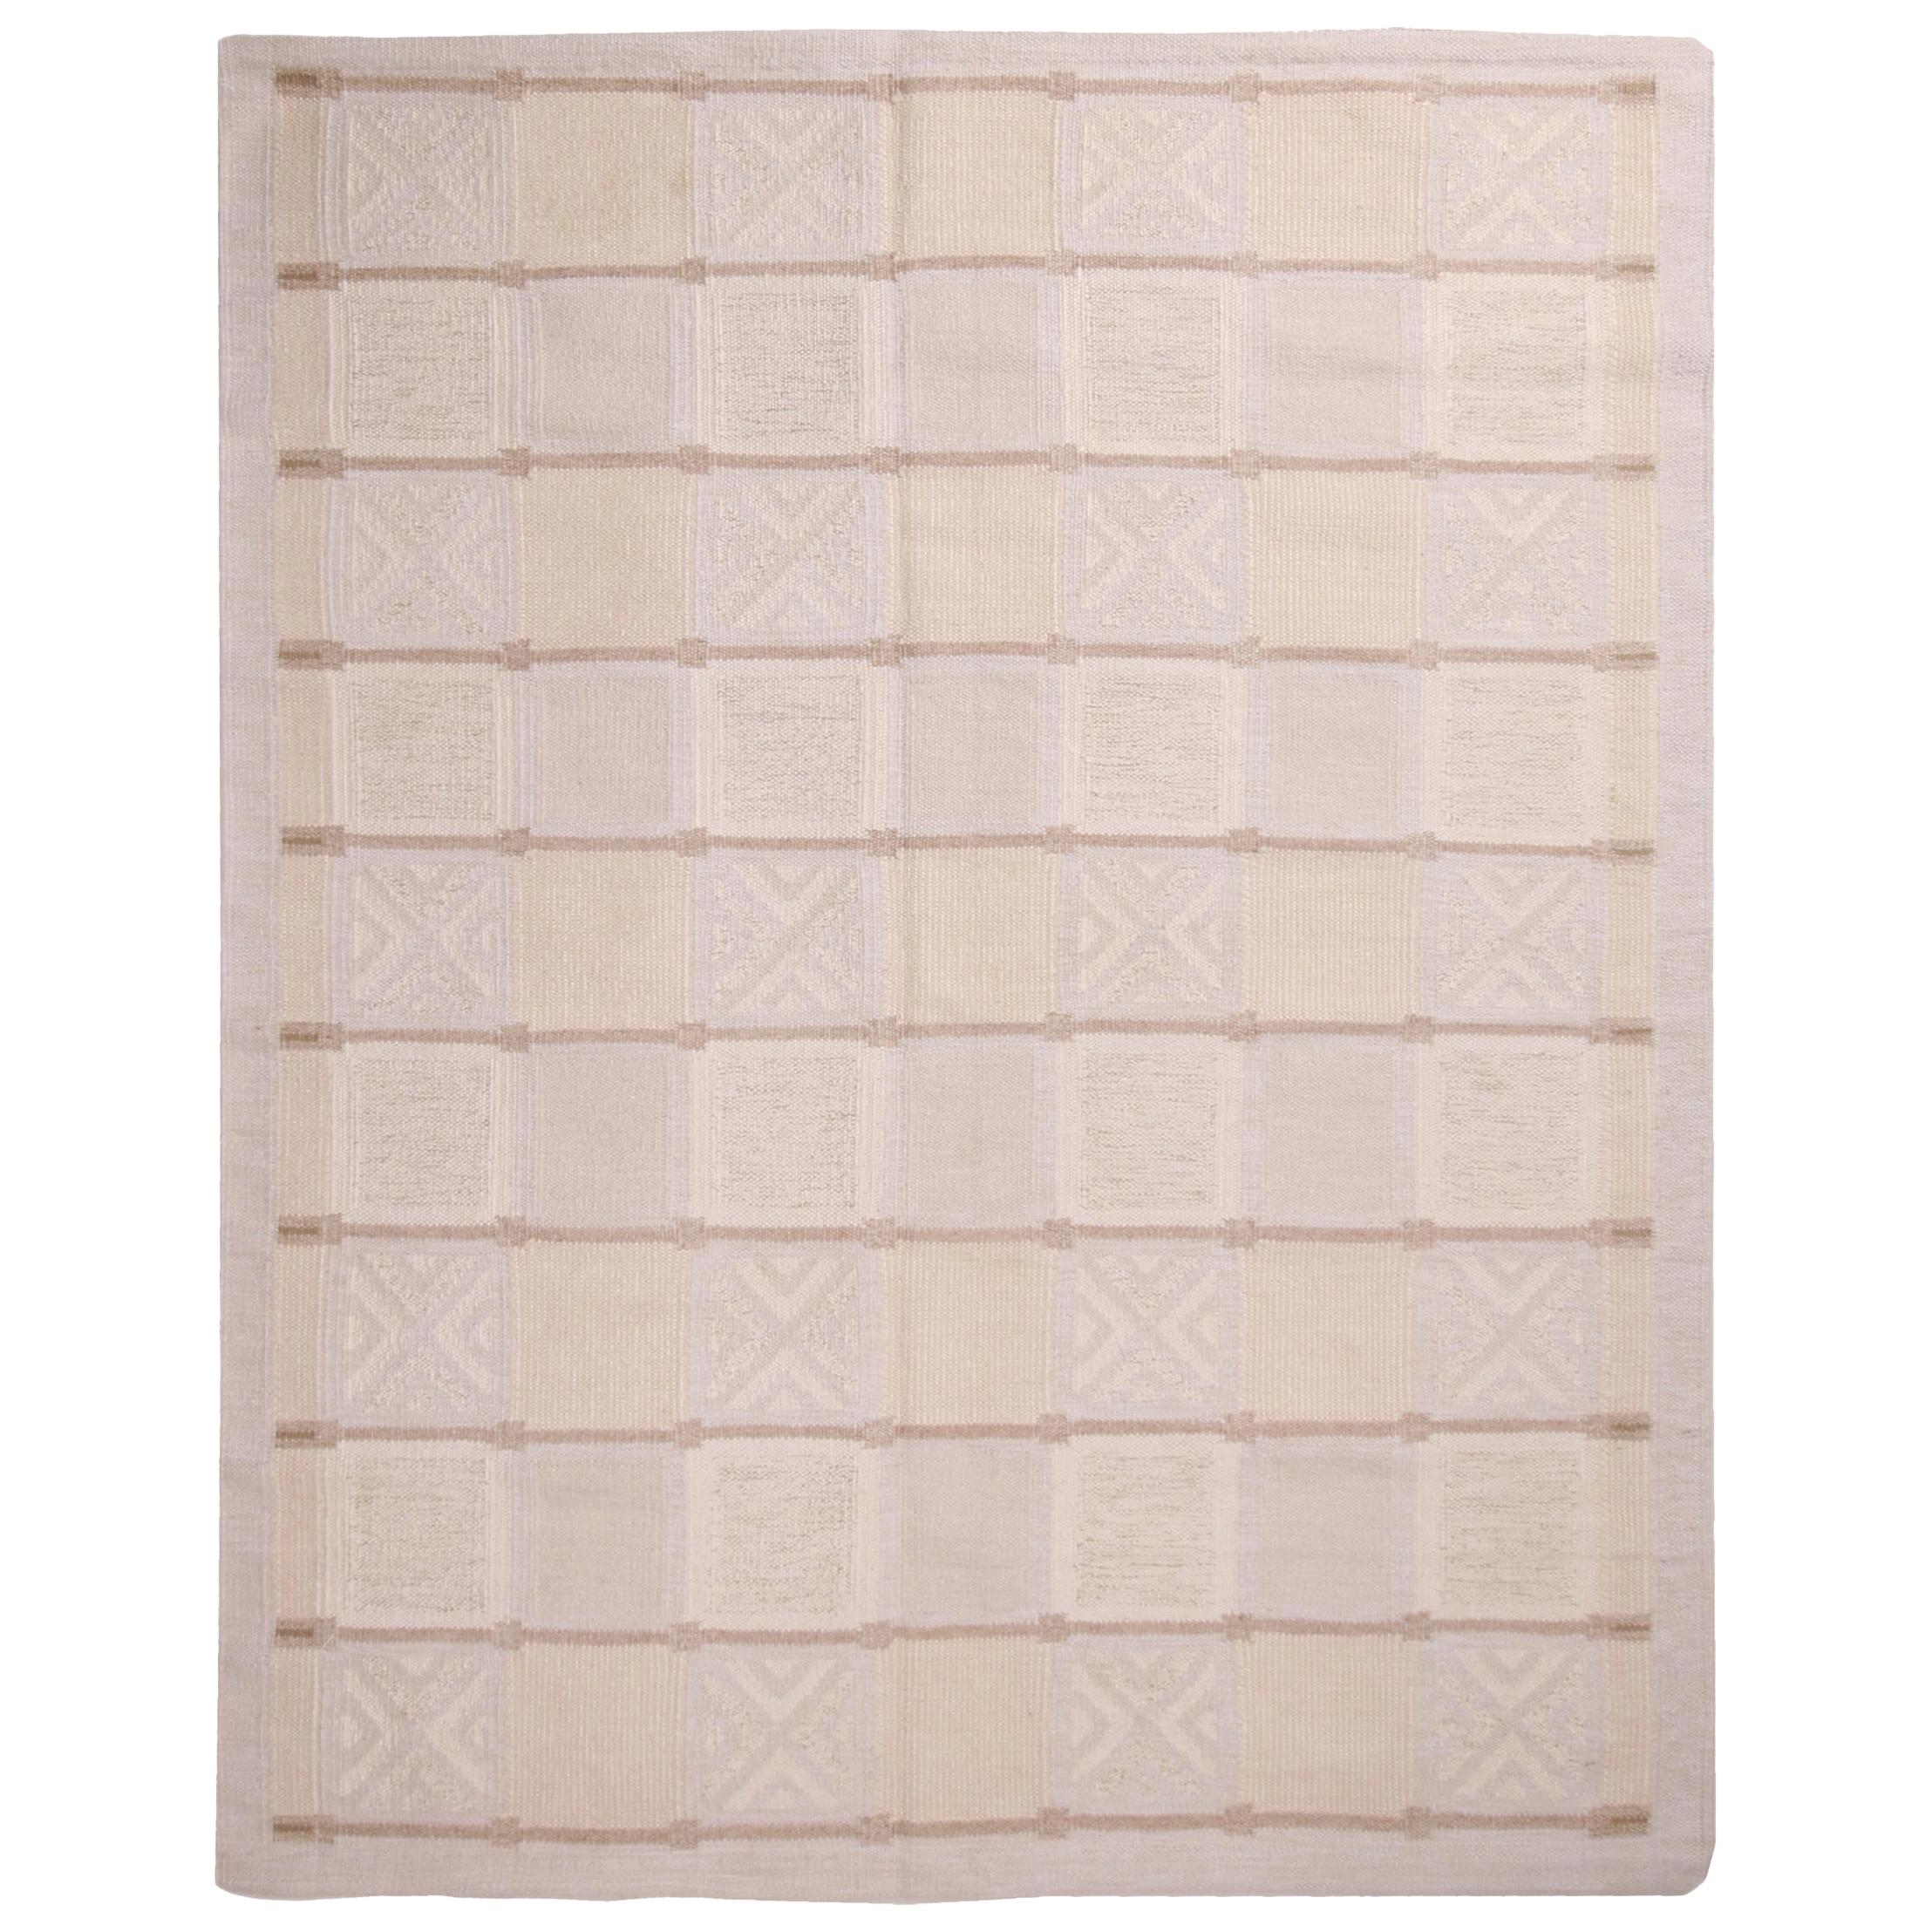 Scandinavian Inspired Geometric Gray and Cream Wool Pile Rug